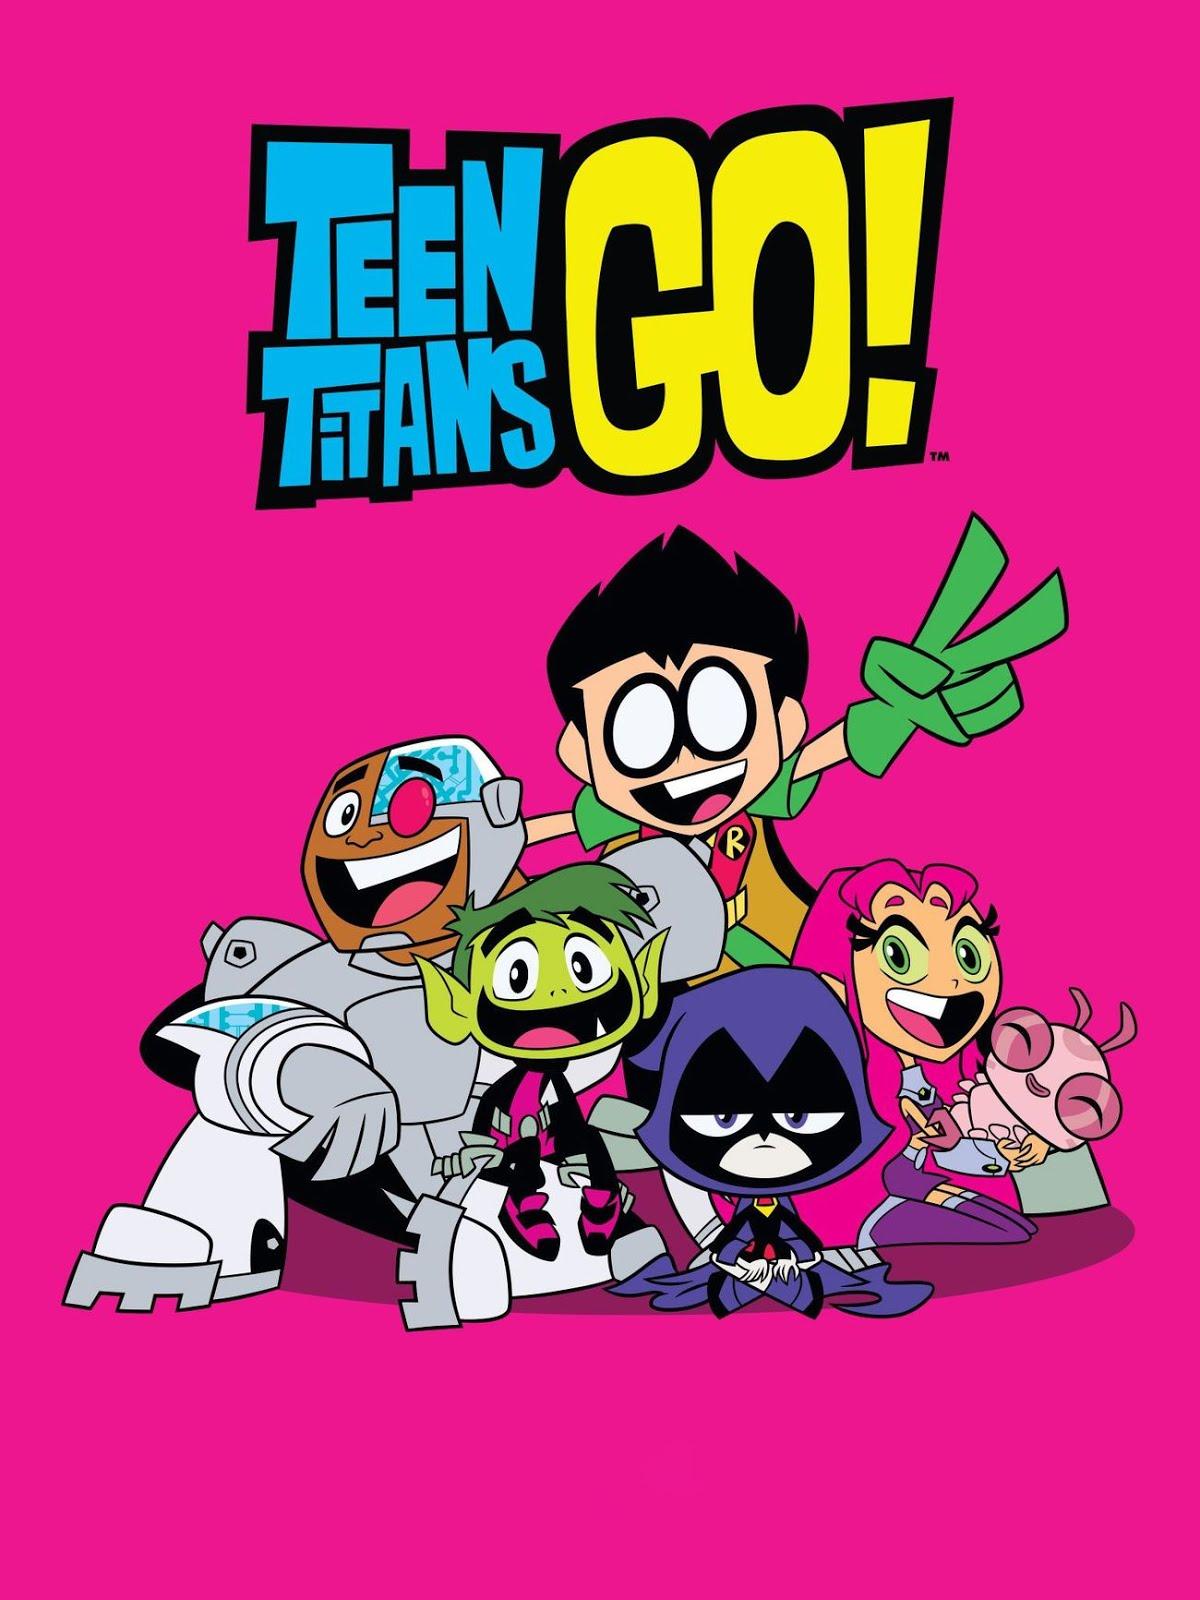 Haideti Tineri Titani Online Desene animate dublate Sezonul 4 Episodul 1